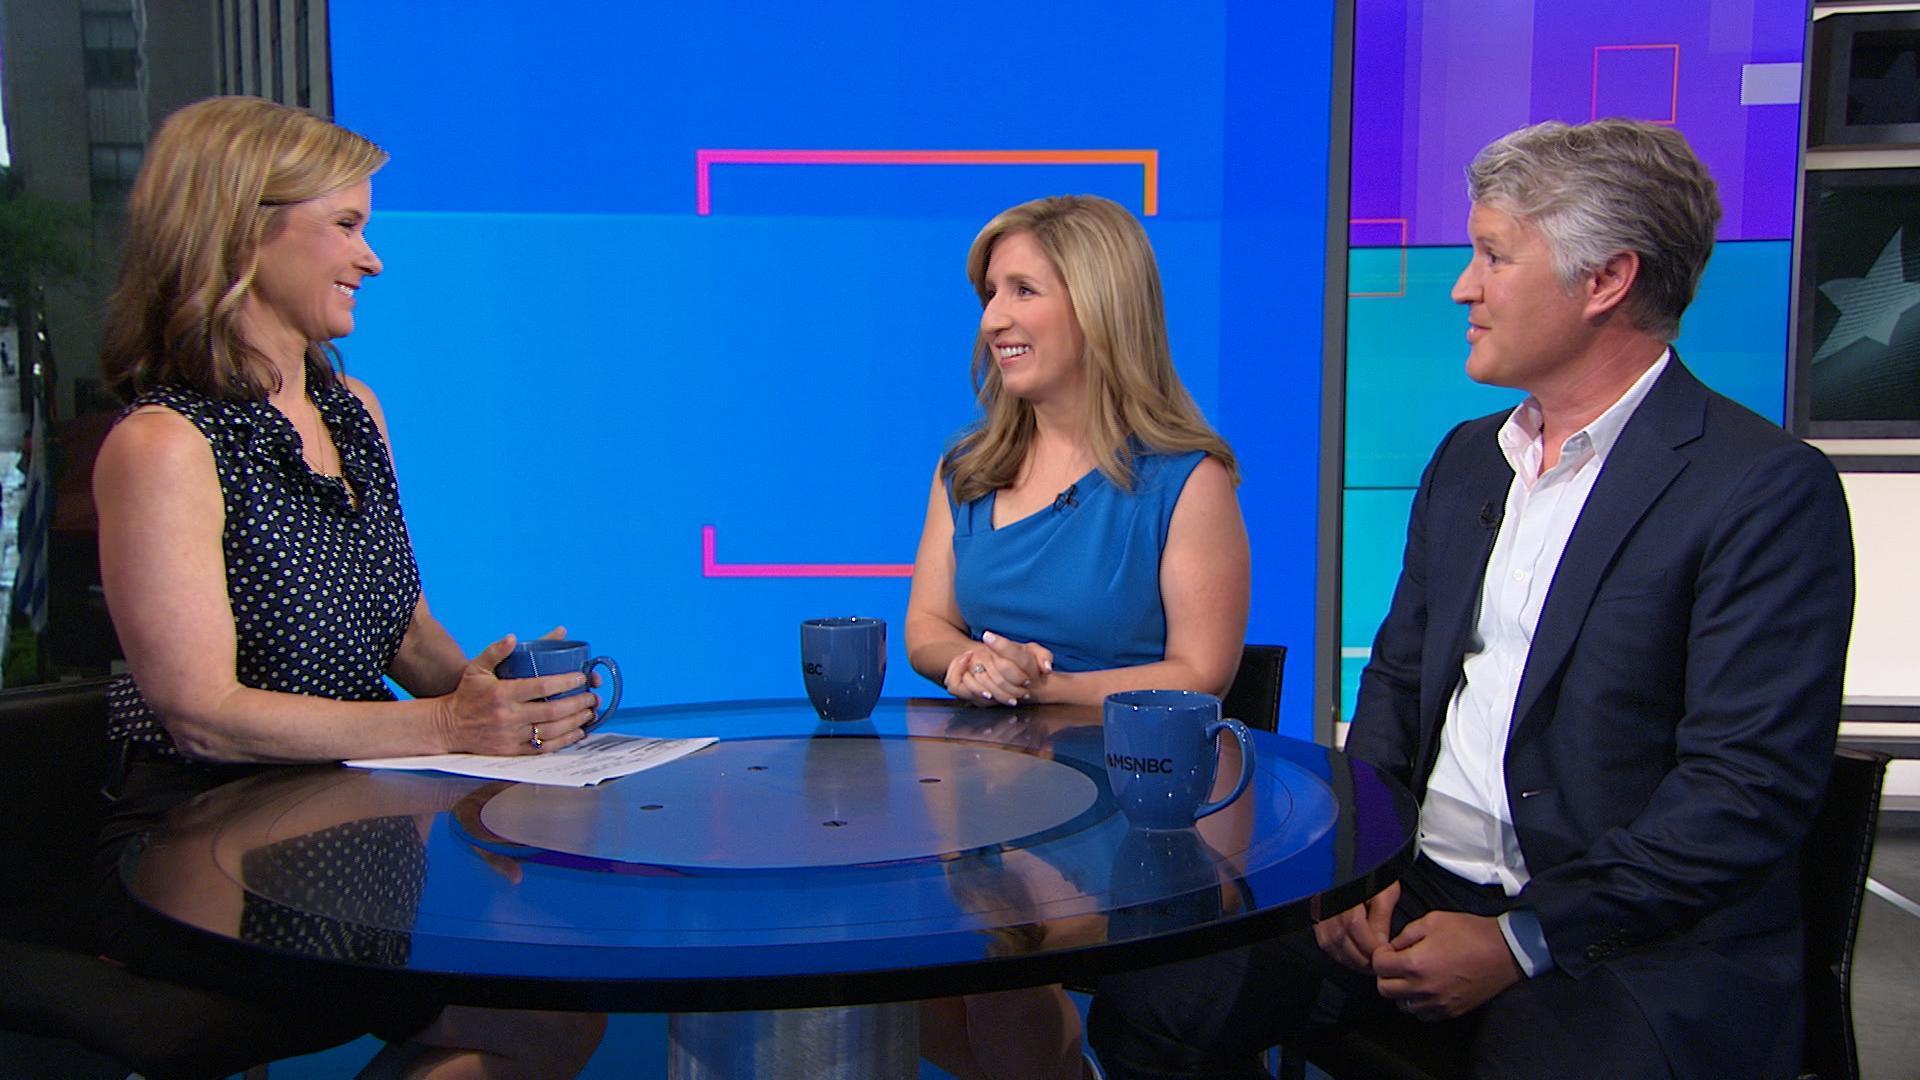 Tom Davidson & Jennifer Dulski share advice for growing your business